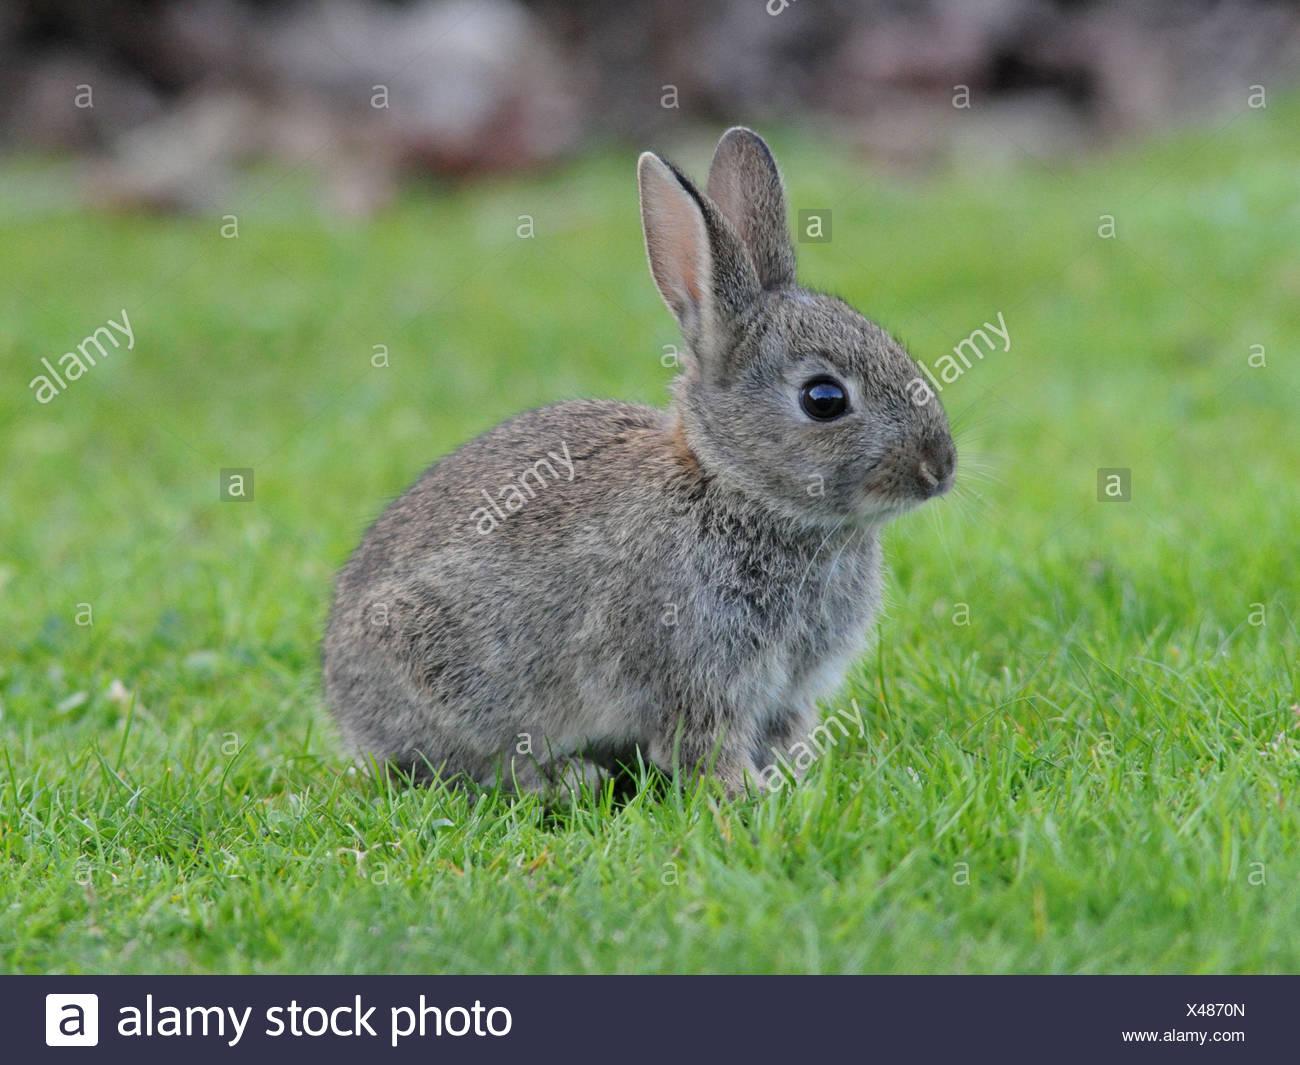 A small wild grey baby rabbit. - Stock Image